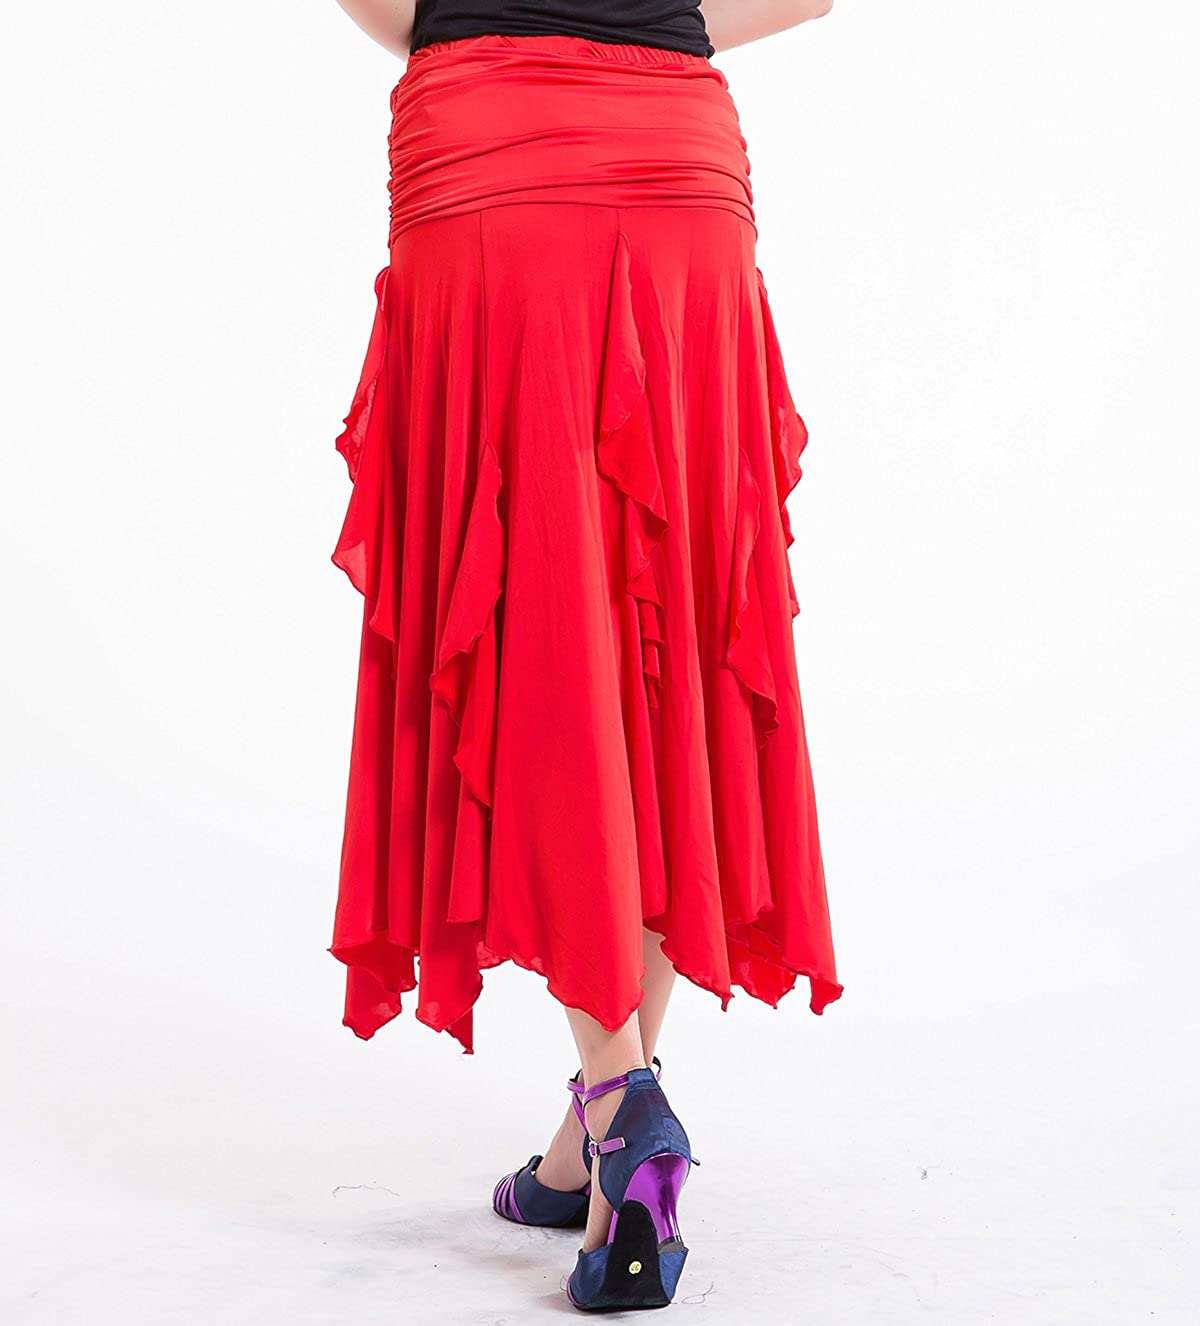 Amazon.com: whitewed Foxtrot Latina Flamenco American Smooth ...